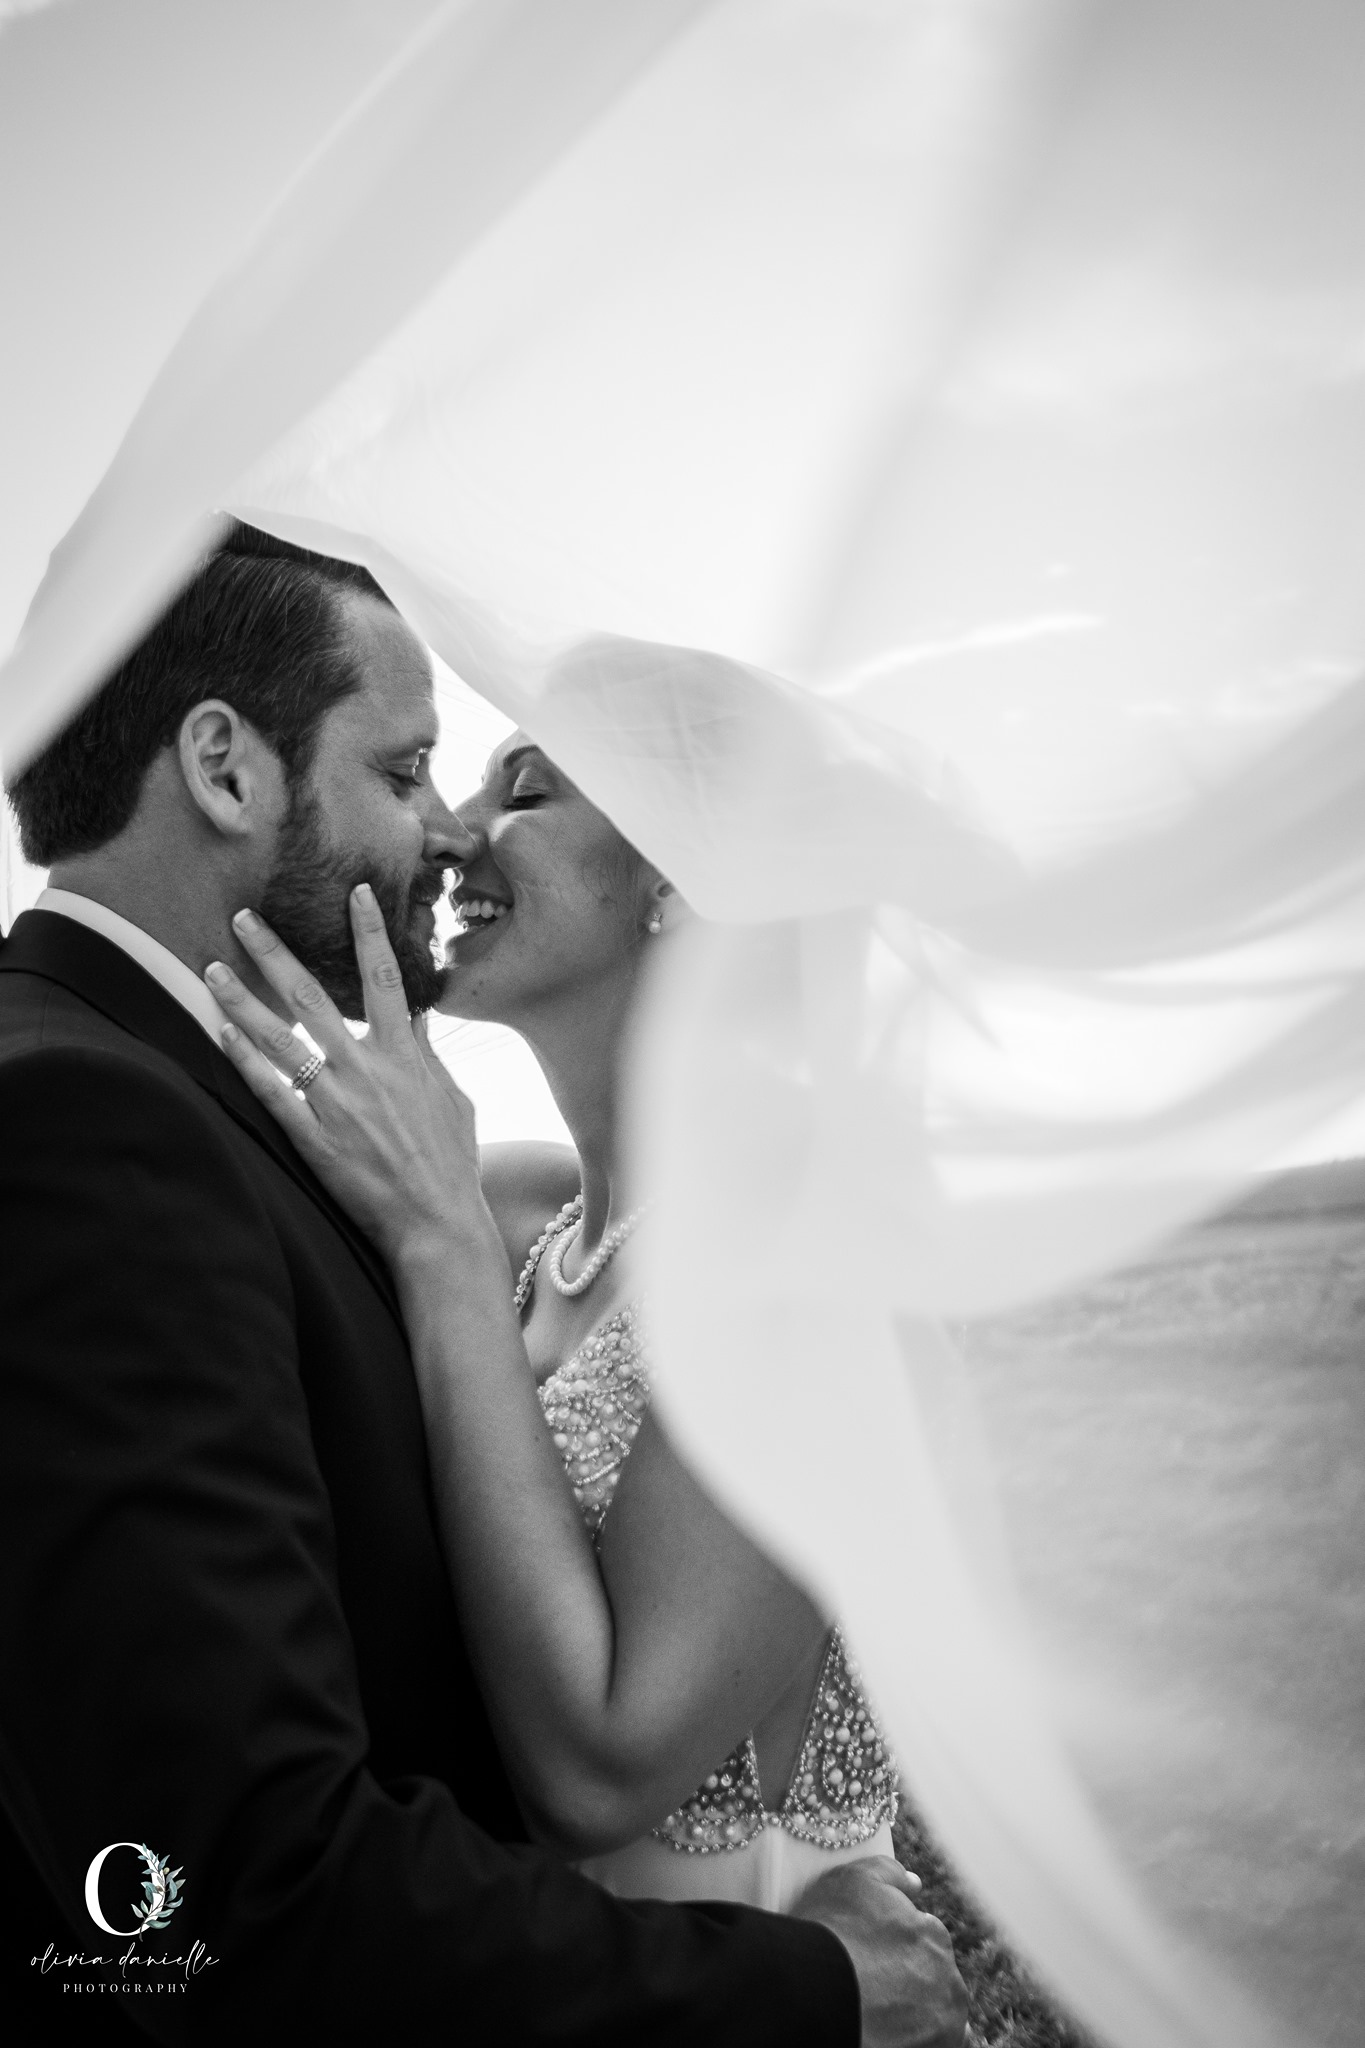 Olivia Danielle Photography's Elopement/Micro Wedding Photo